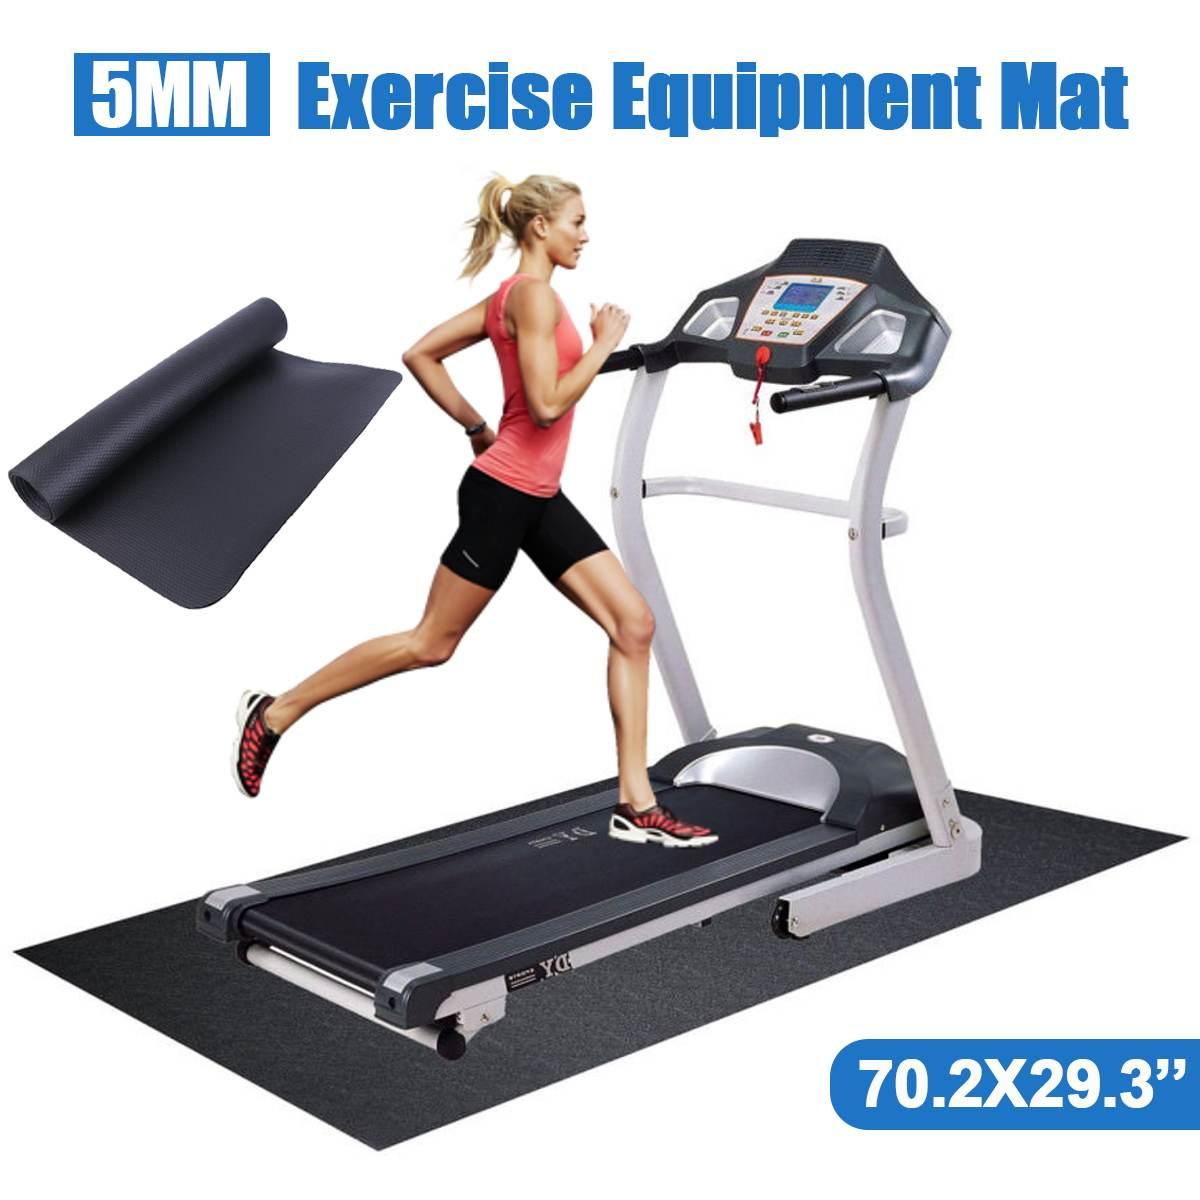 180x75cm NBR Exercise Mat Gym Fitness Equipment For Treadmill Bike Protect Floor Mat Running Machine Shock Absorbing Pad Black